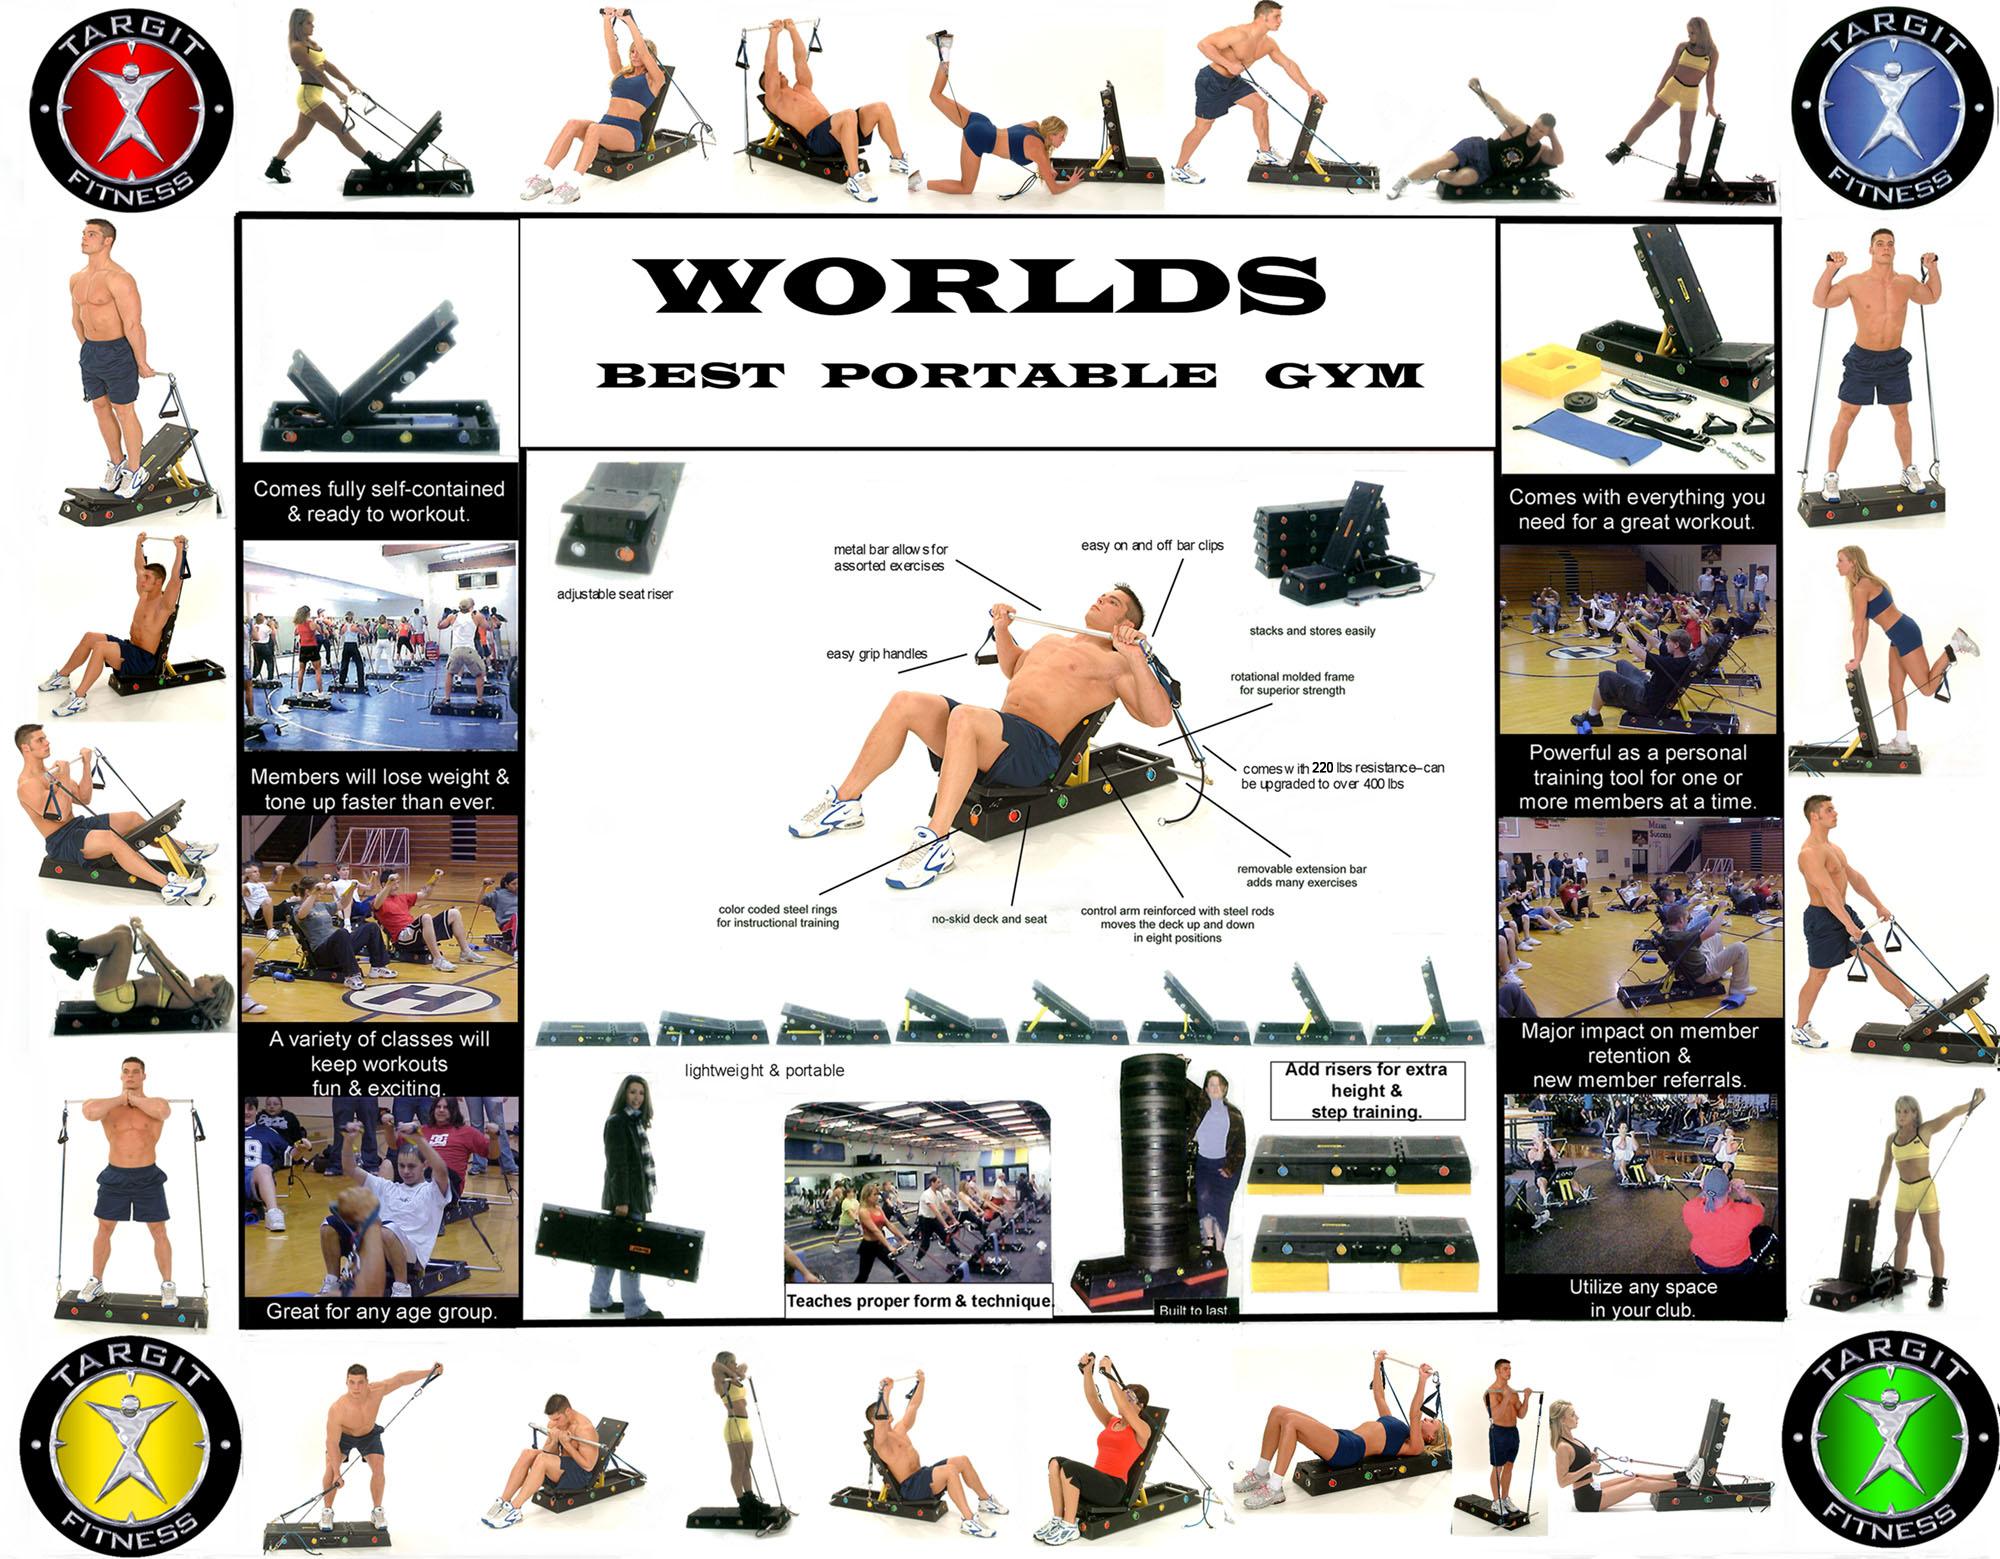 The Picture For Targitfit Portable Gym